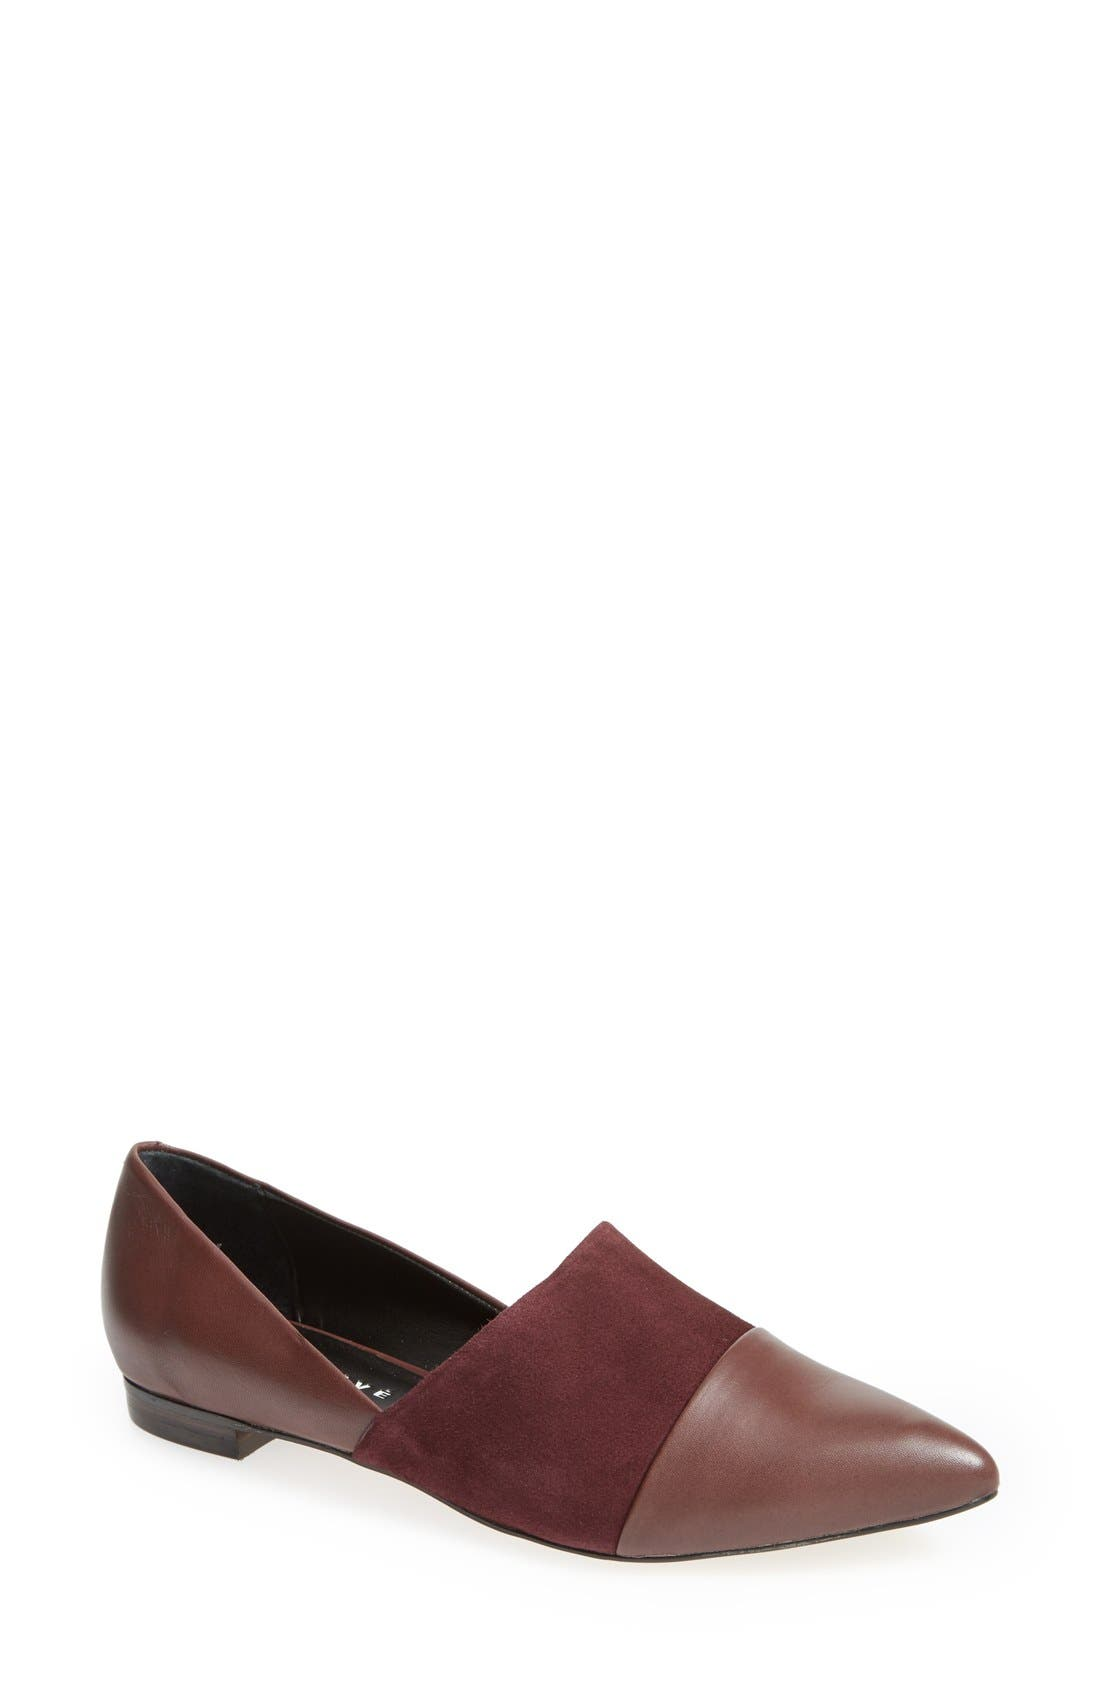 Main Image - Trouvé 'Beal' Pointy Toe Flat (Women)